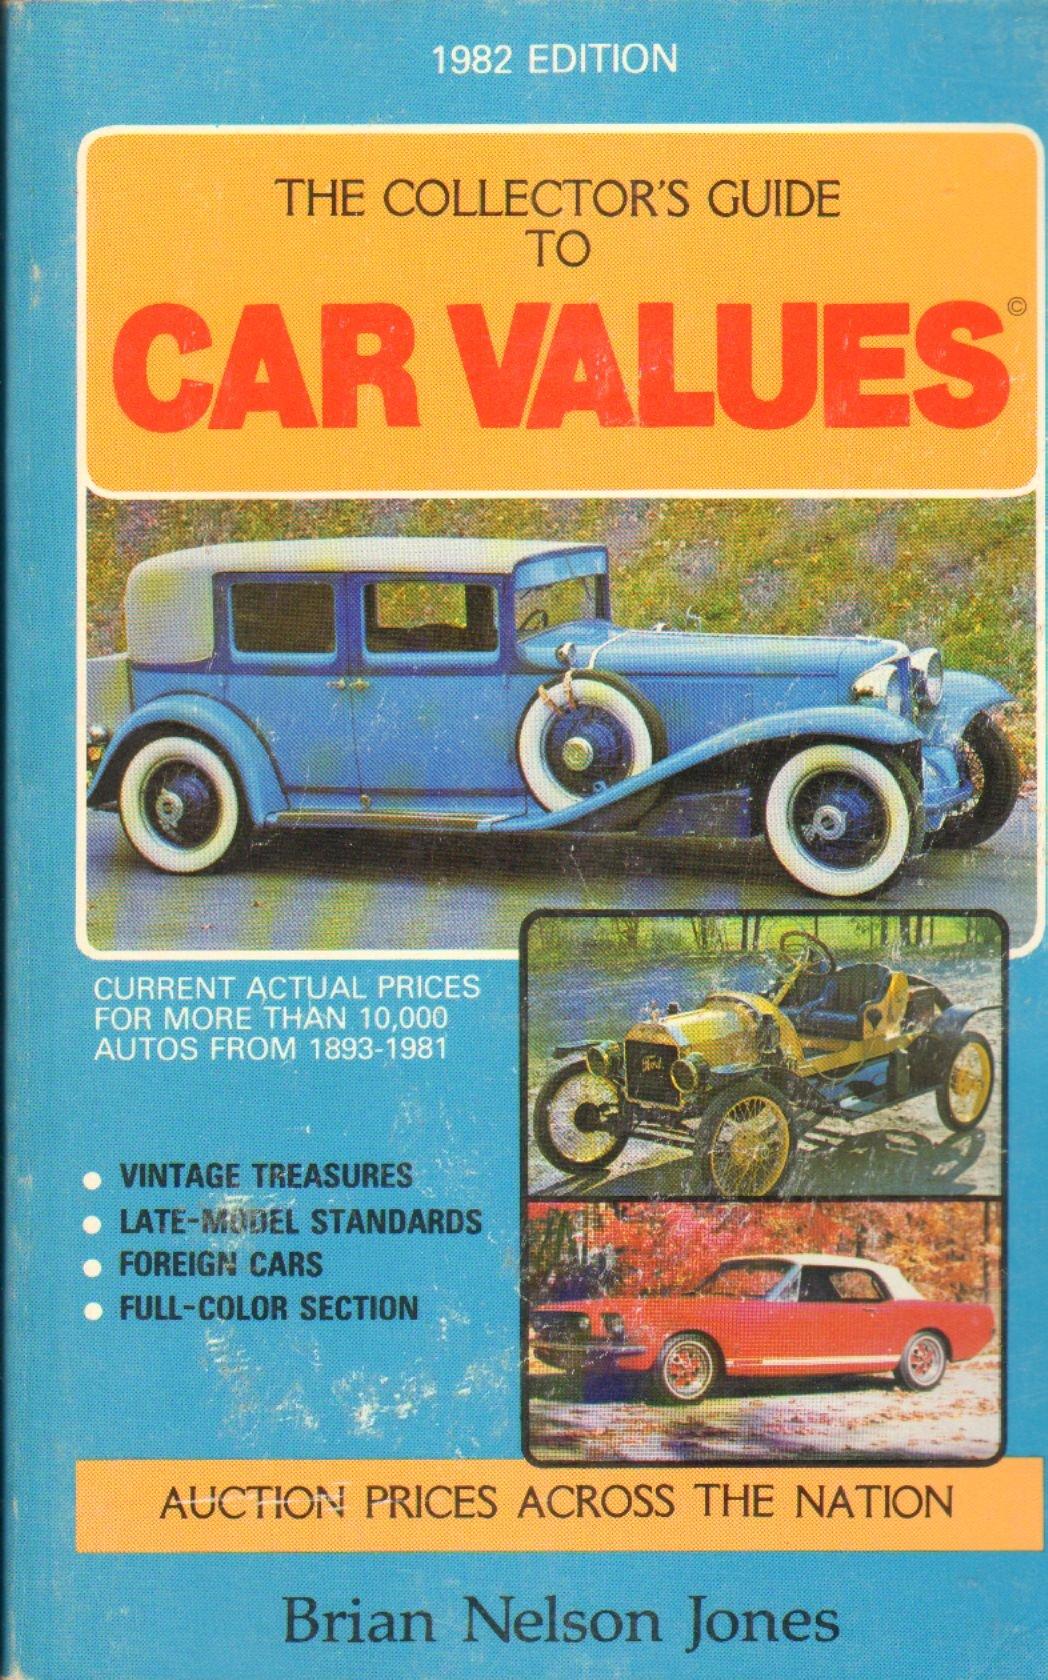 Collector Car Values >> Collector S Guide Car Values 1982 B Jones 9780528881428